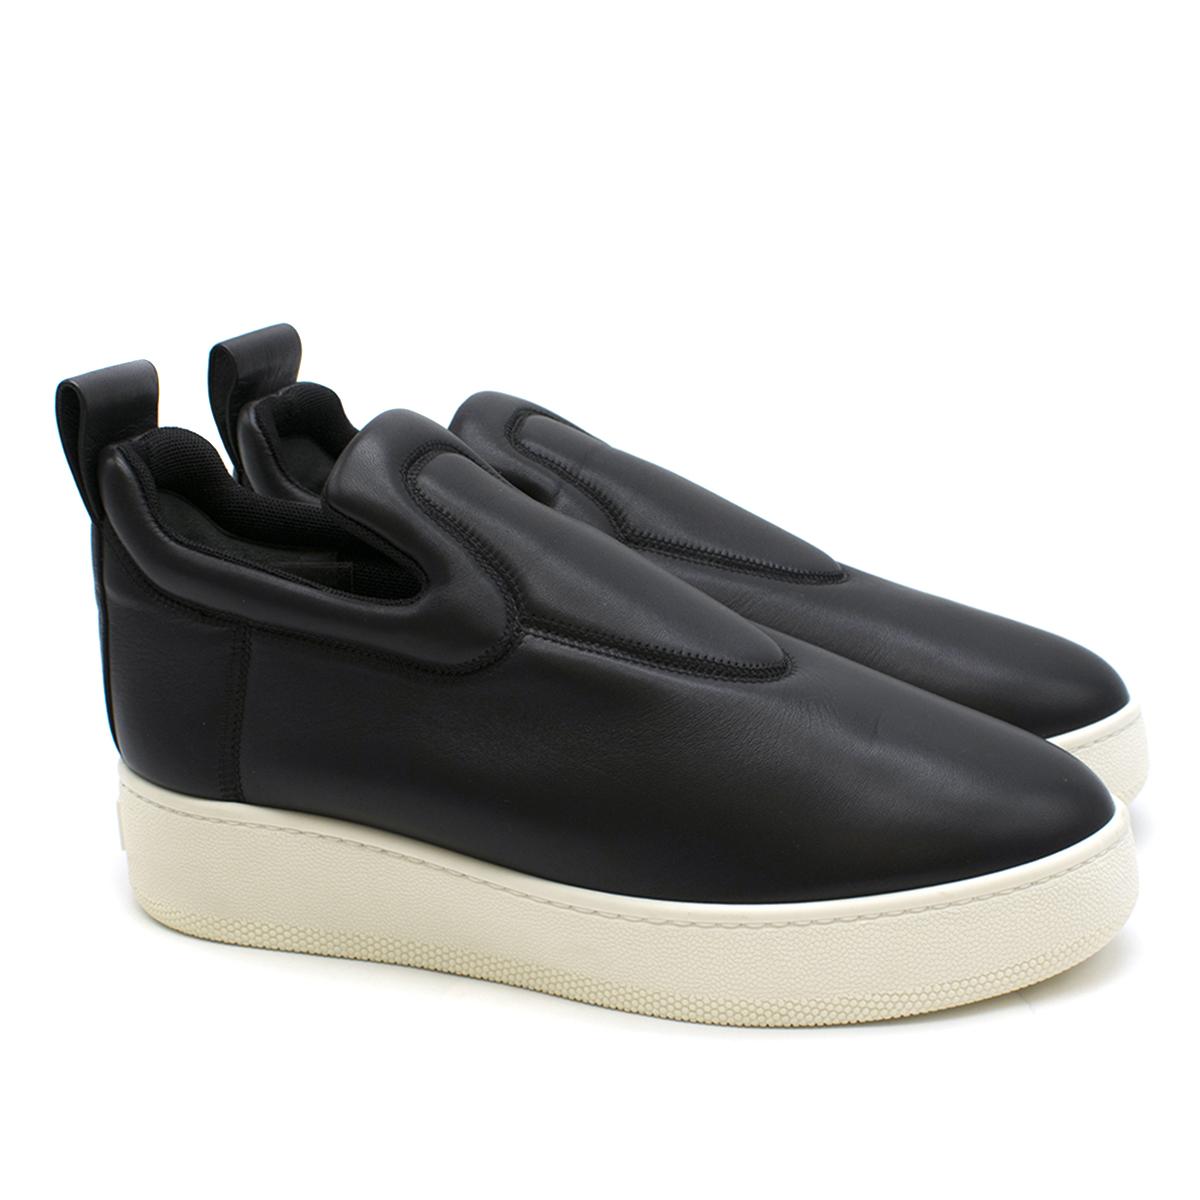 Celine Black Leather Slip On Sneakers